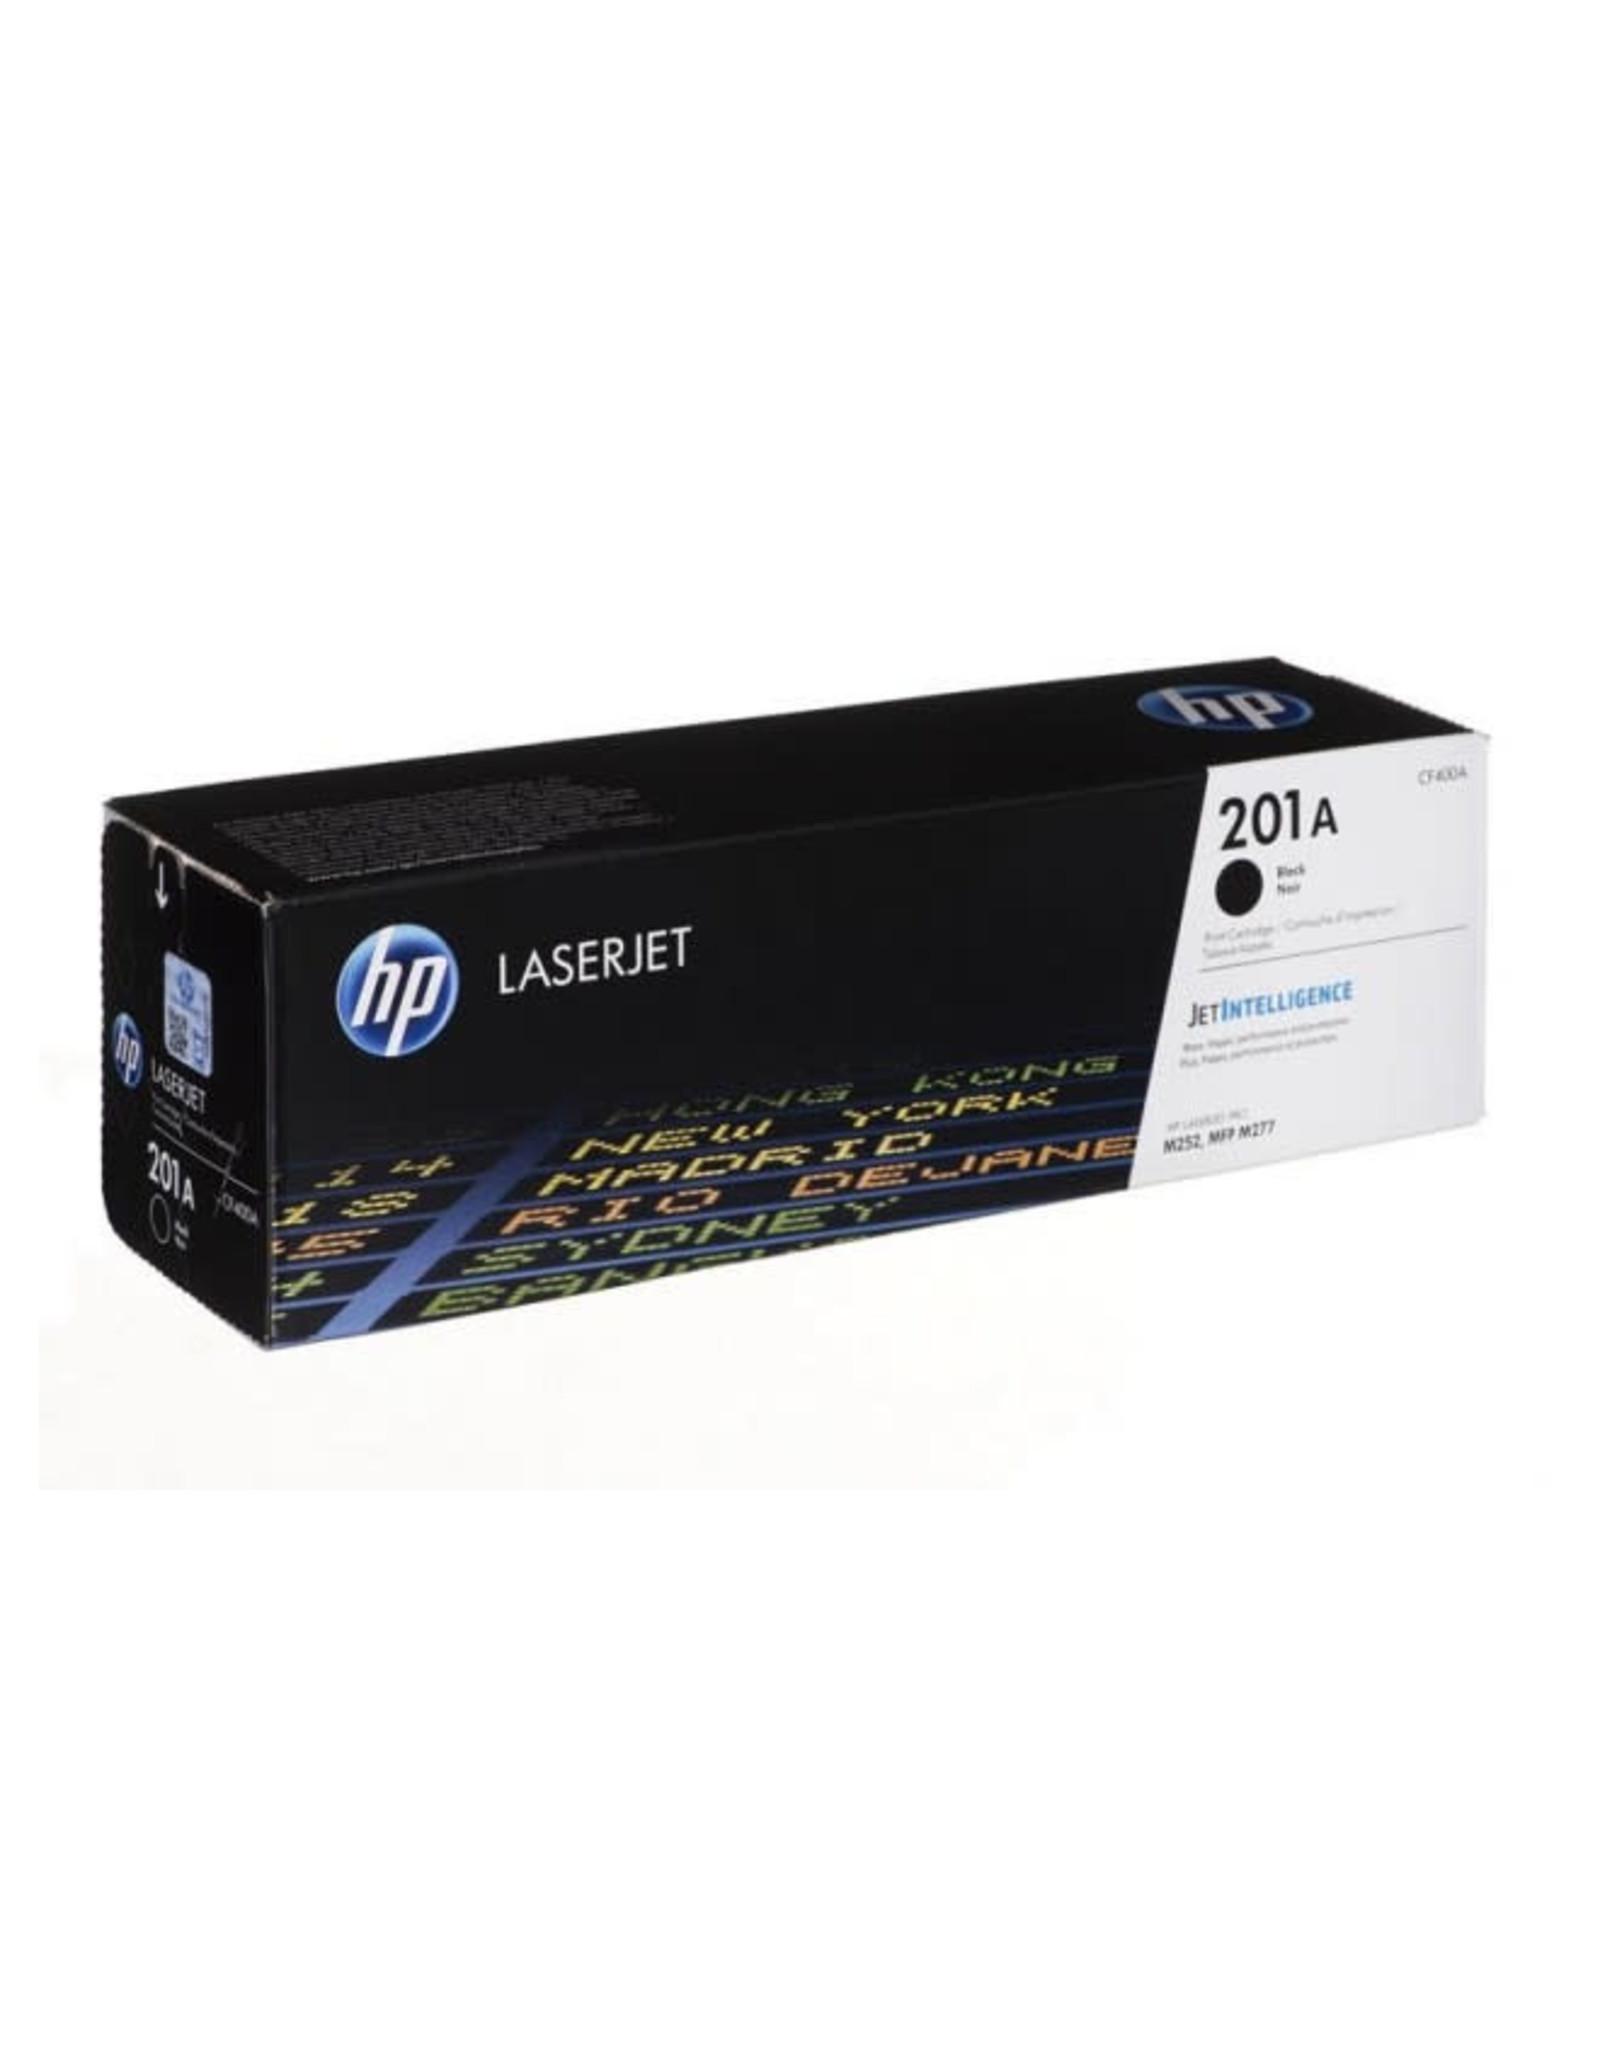 HP LASER TONER-HP #201A BLACK